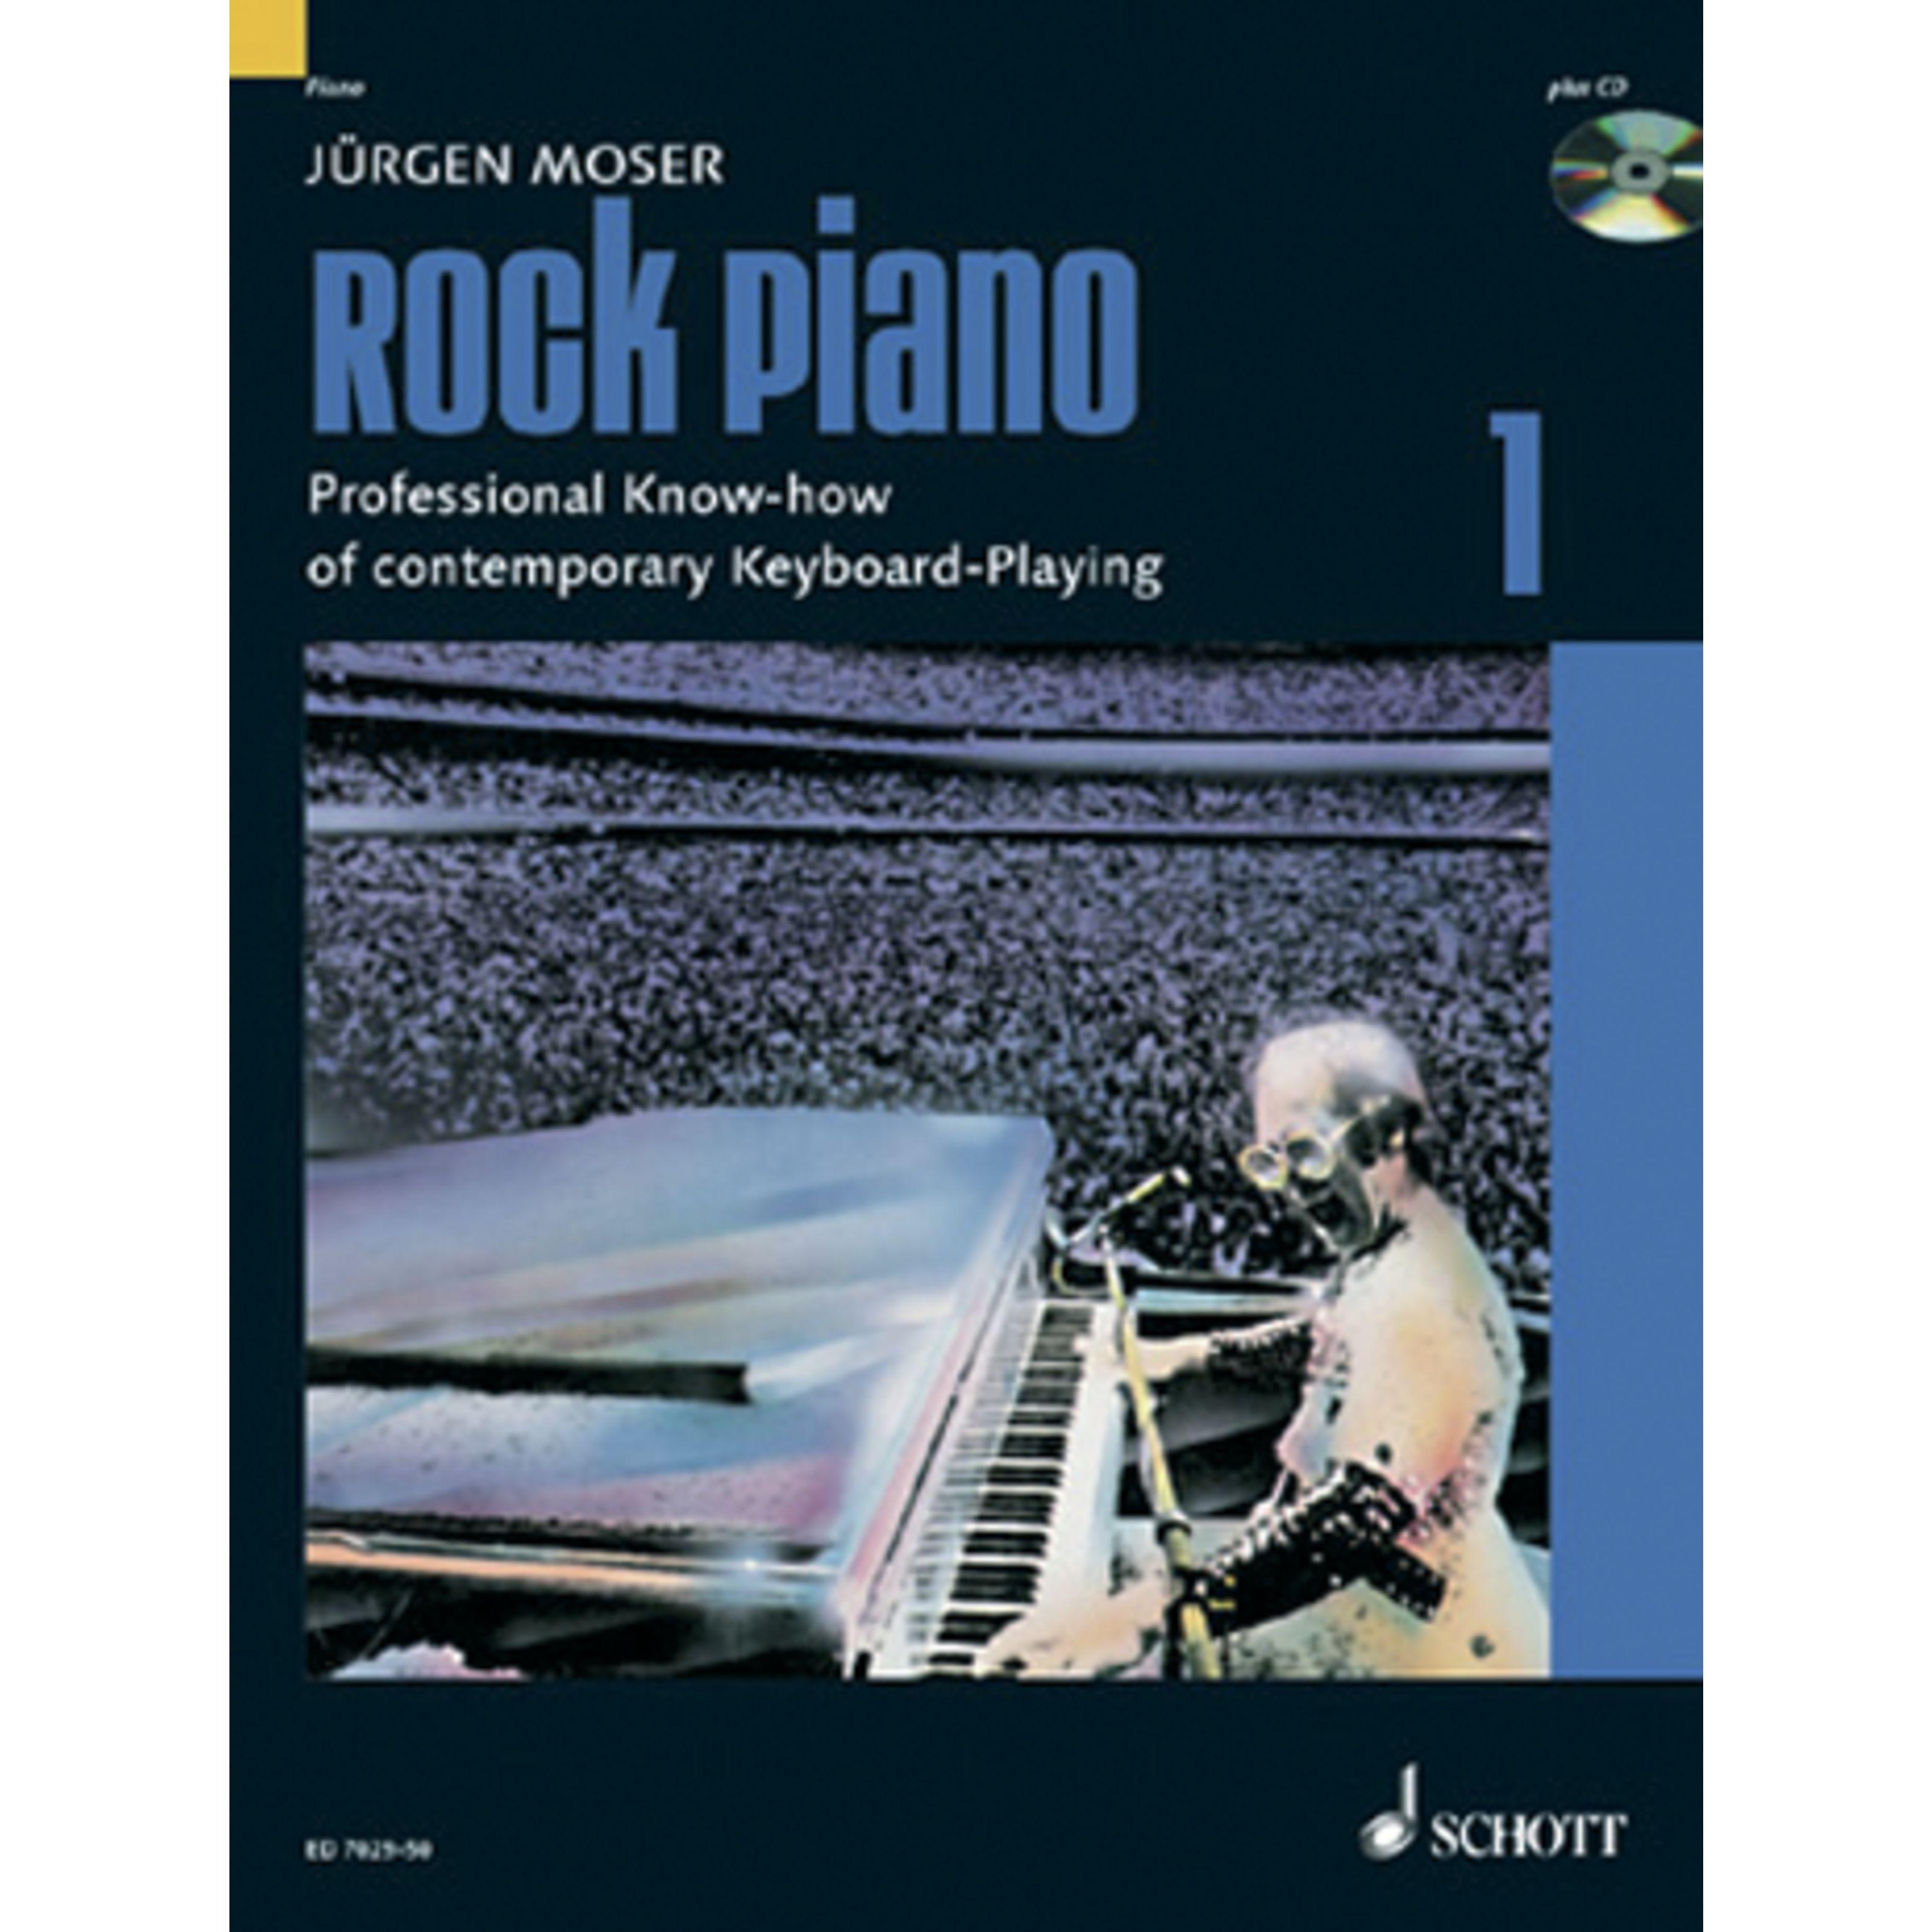 Schott Music - Rock Piano 1 Jürgen Moser,inkl. CD ED 7029